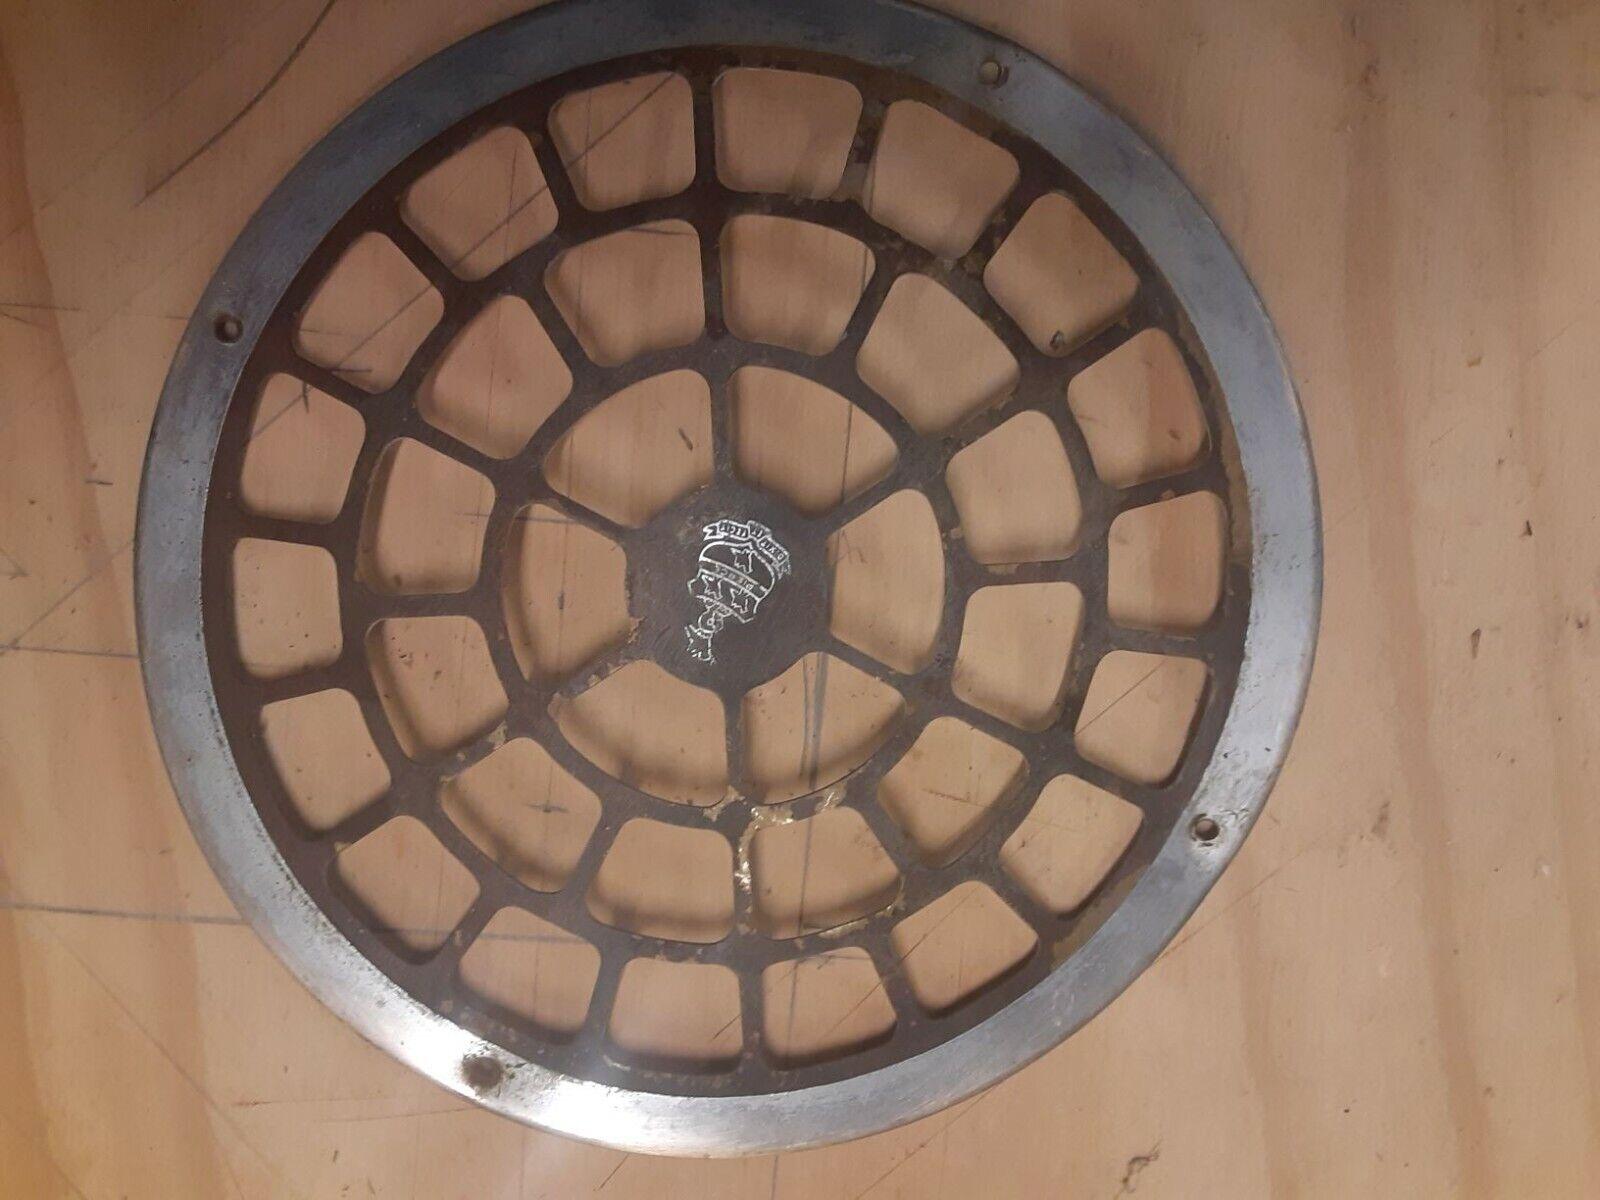 Image 1 - Rare Pierce Arrow Radio Grill with Crest